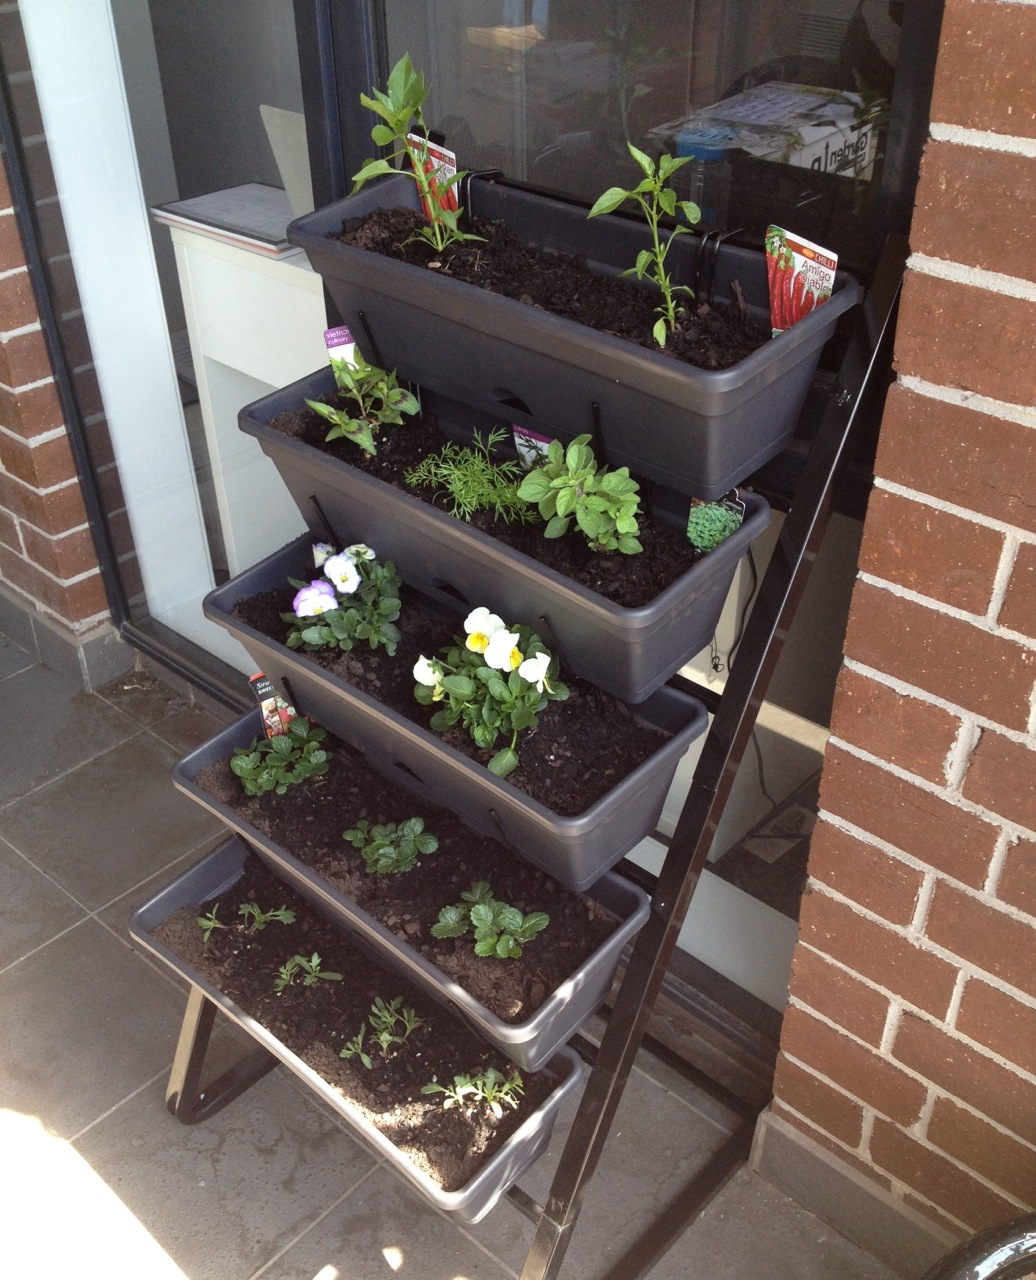 Balcony Gardening: Freestanding Vertical Garden Edition